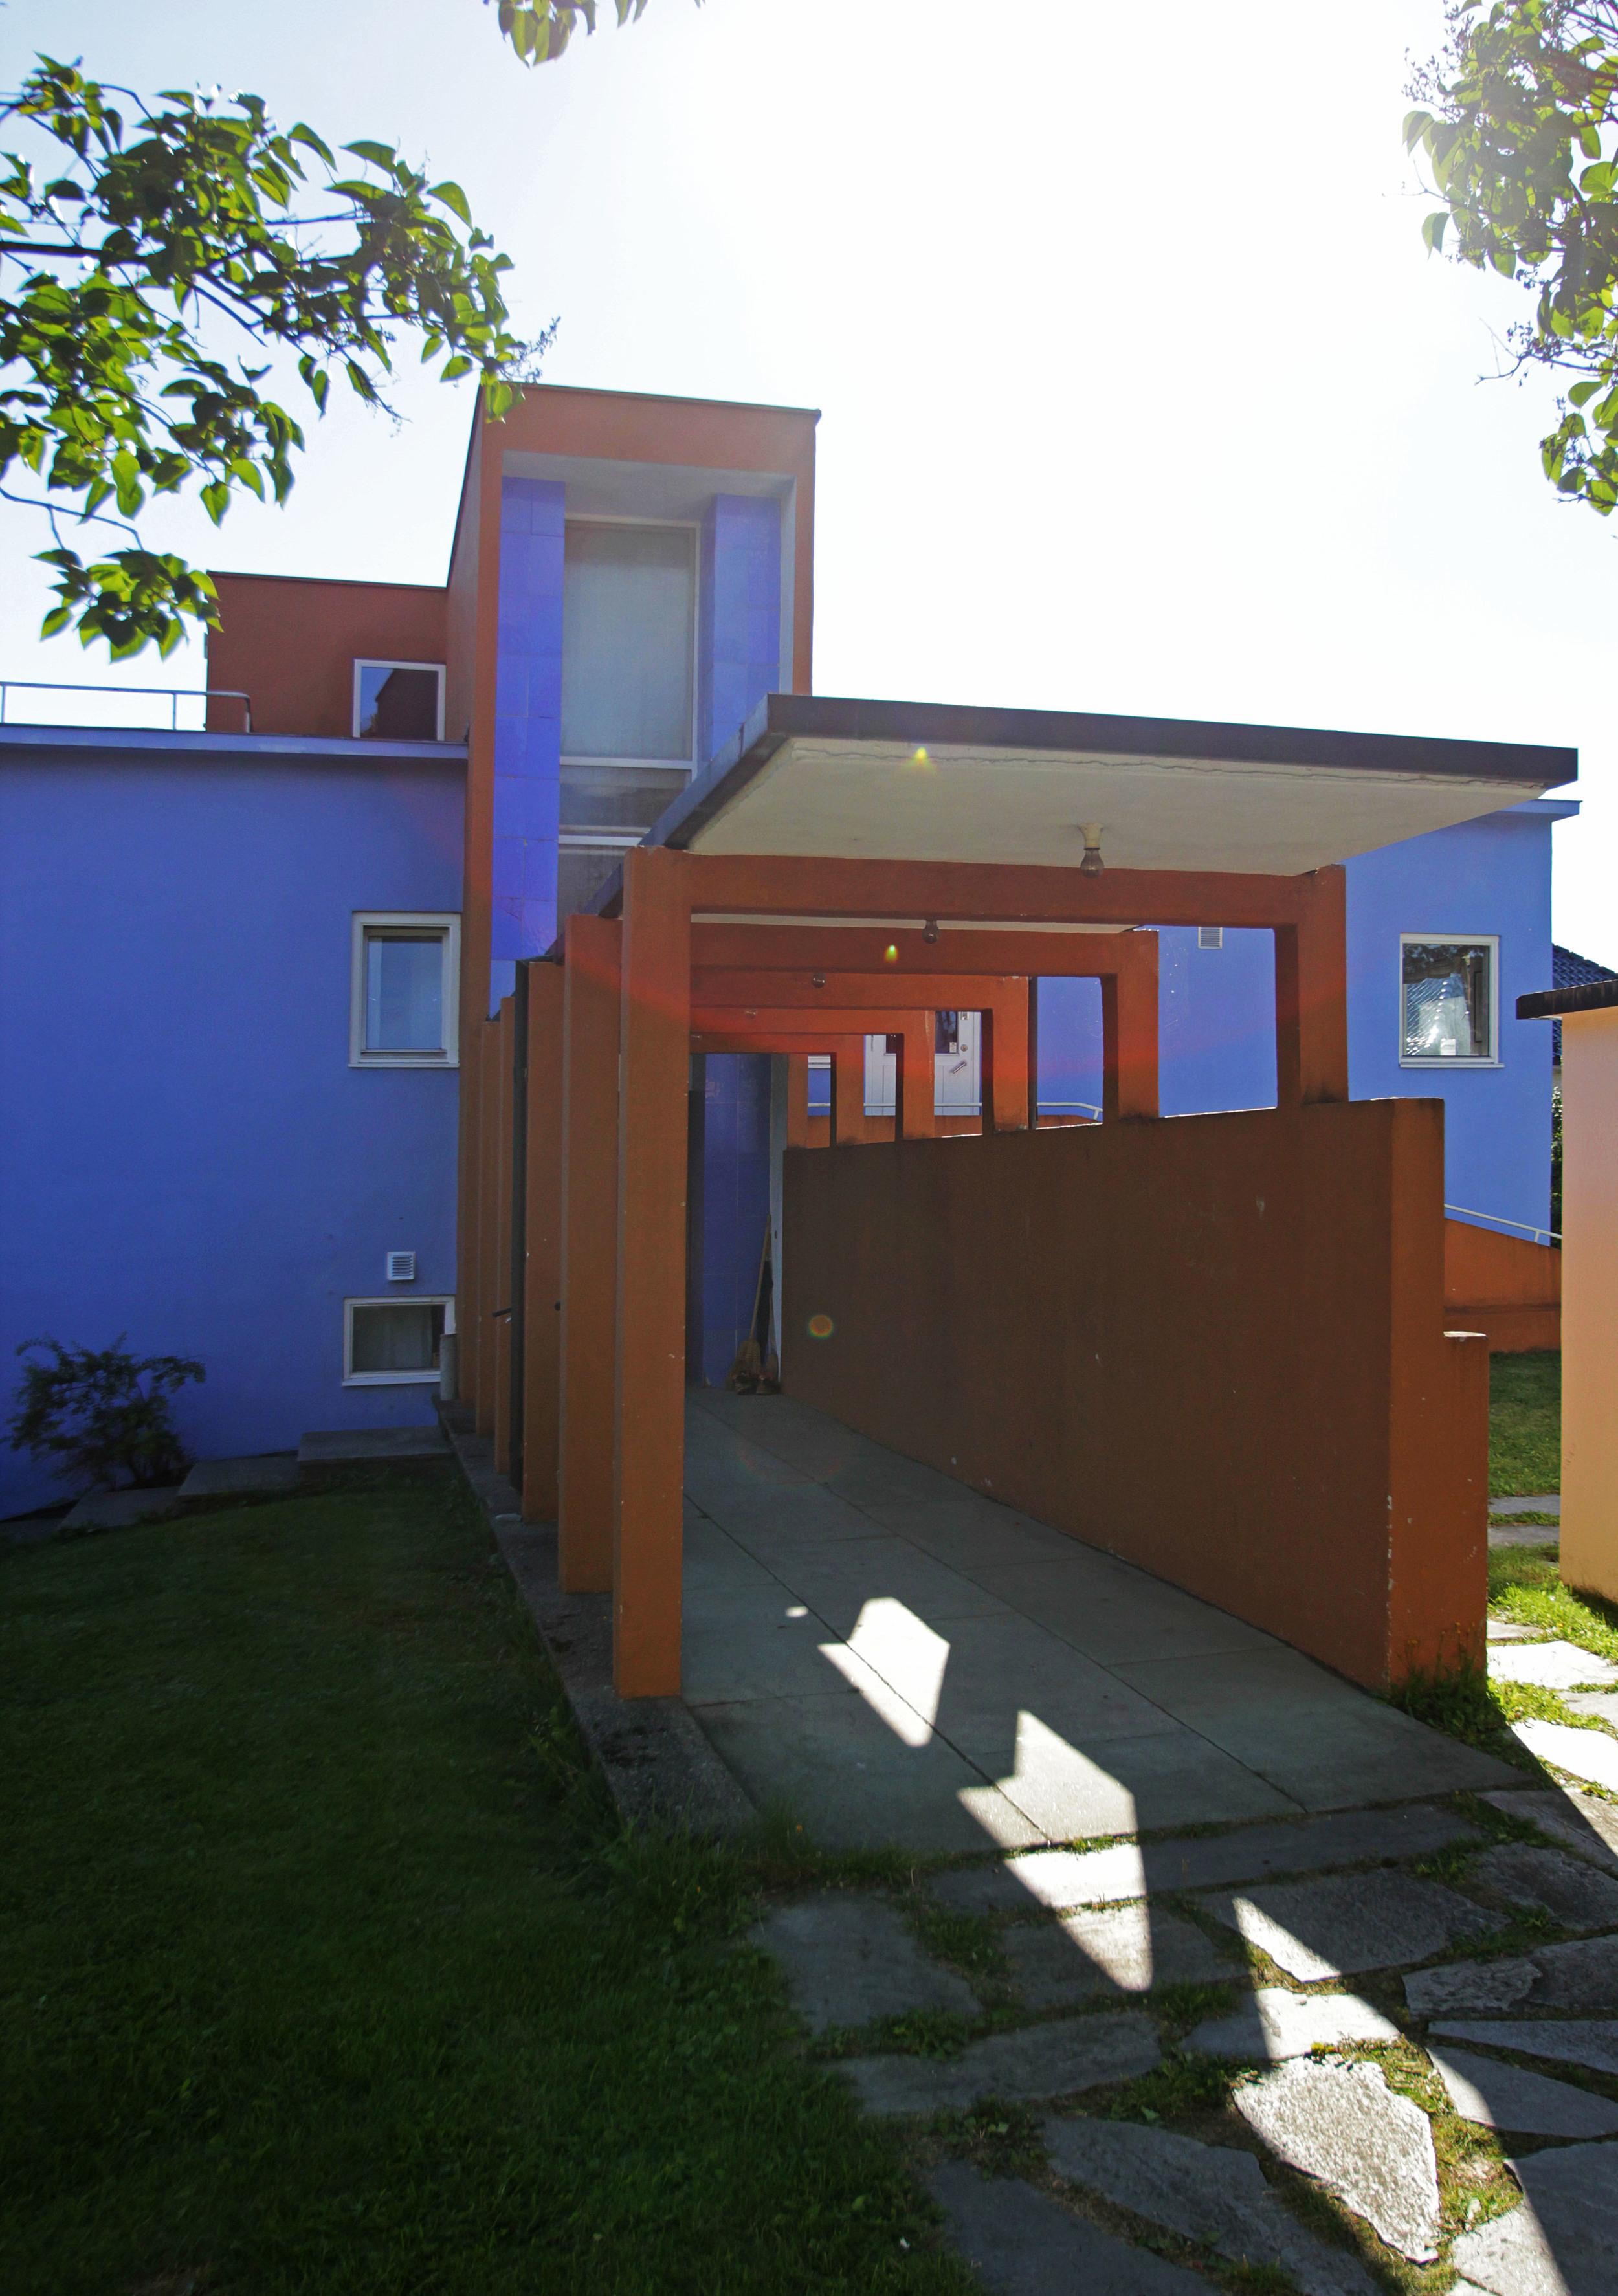 Modernism in Norway